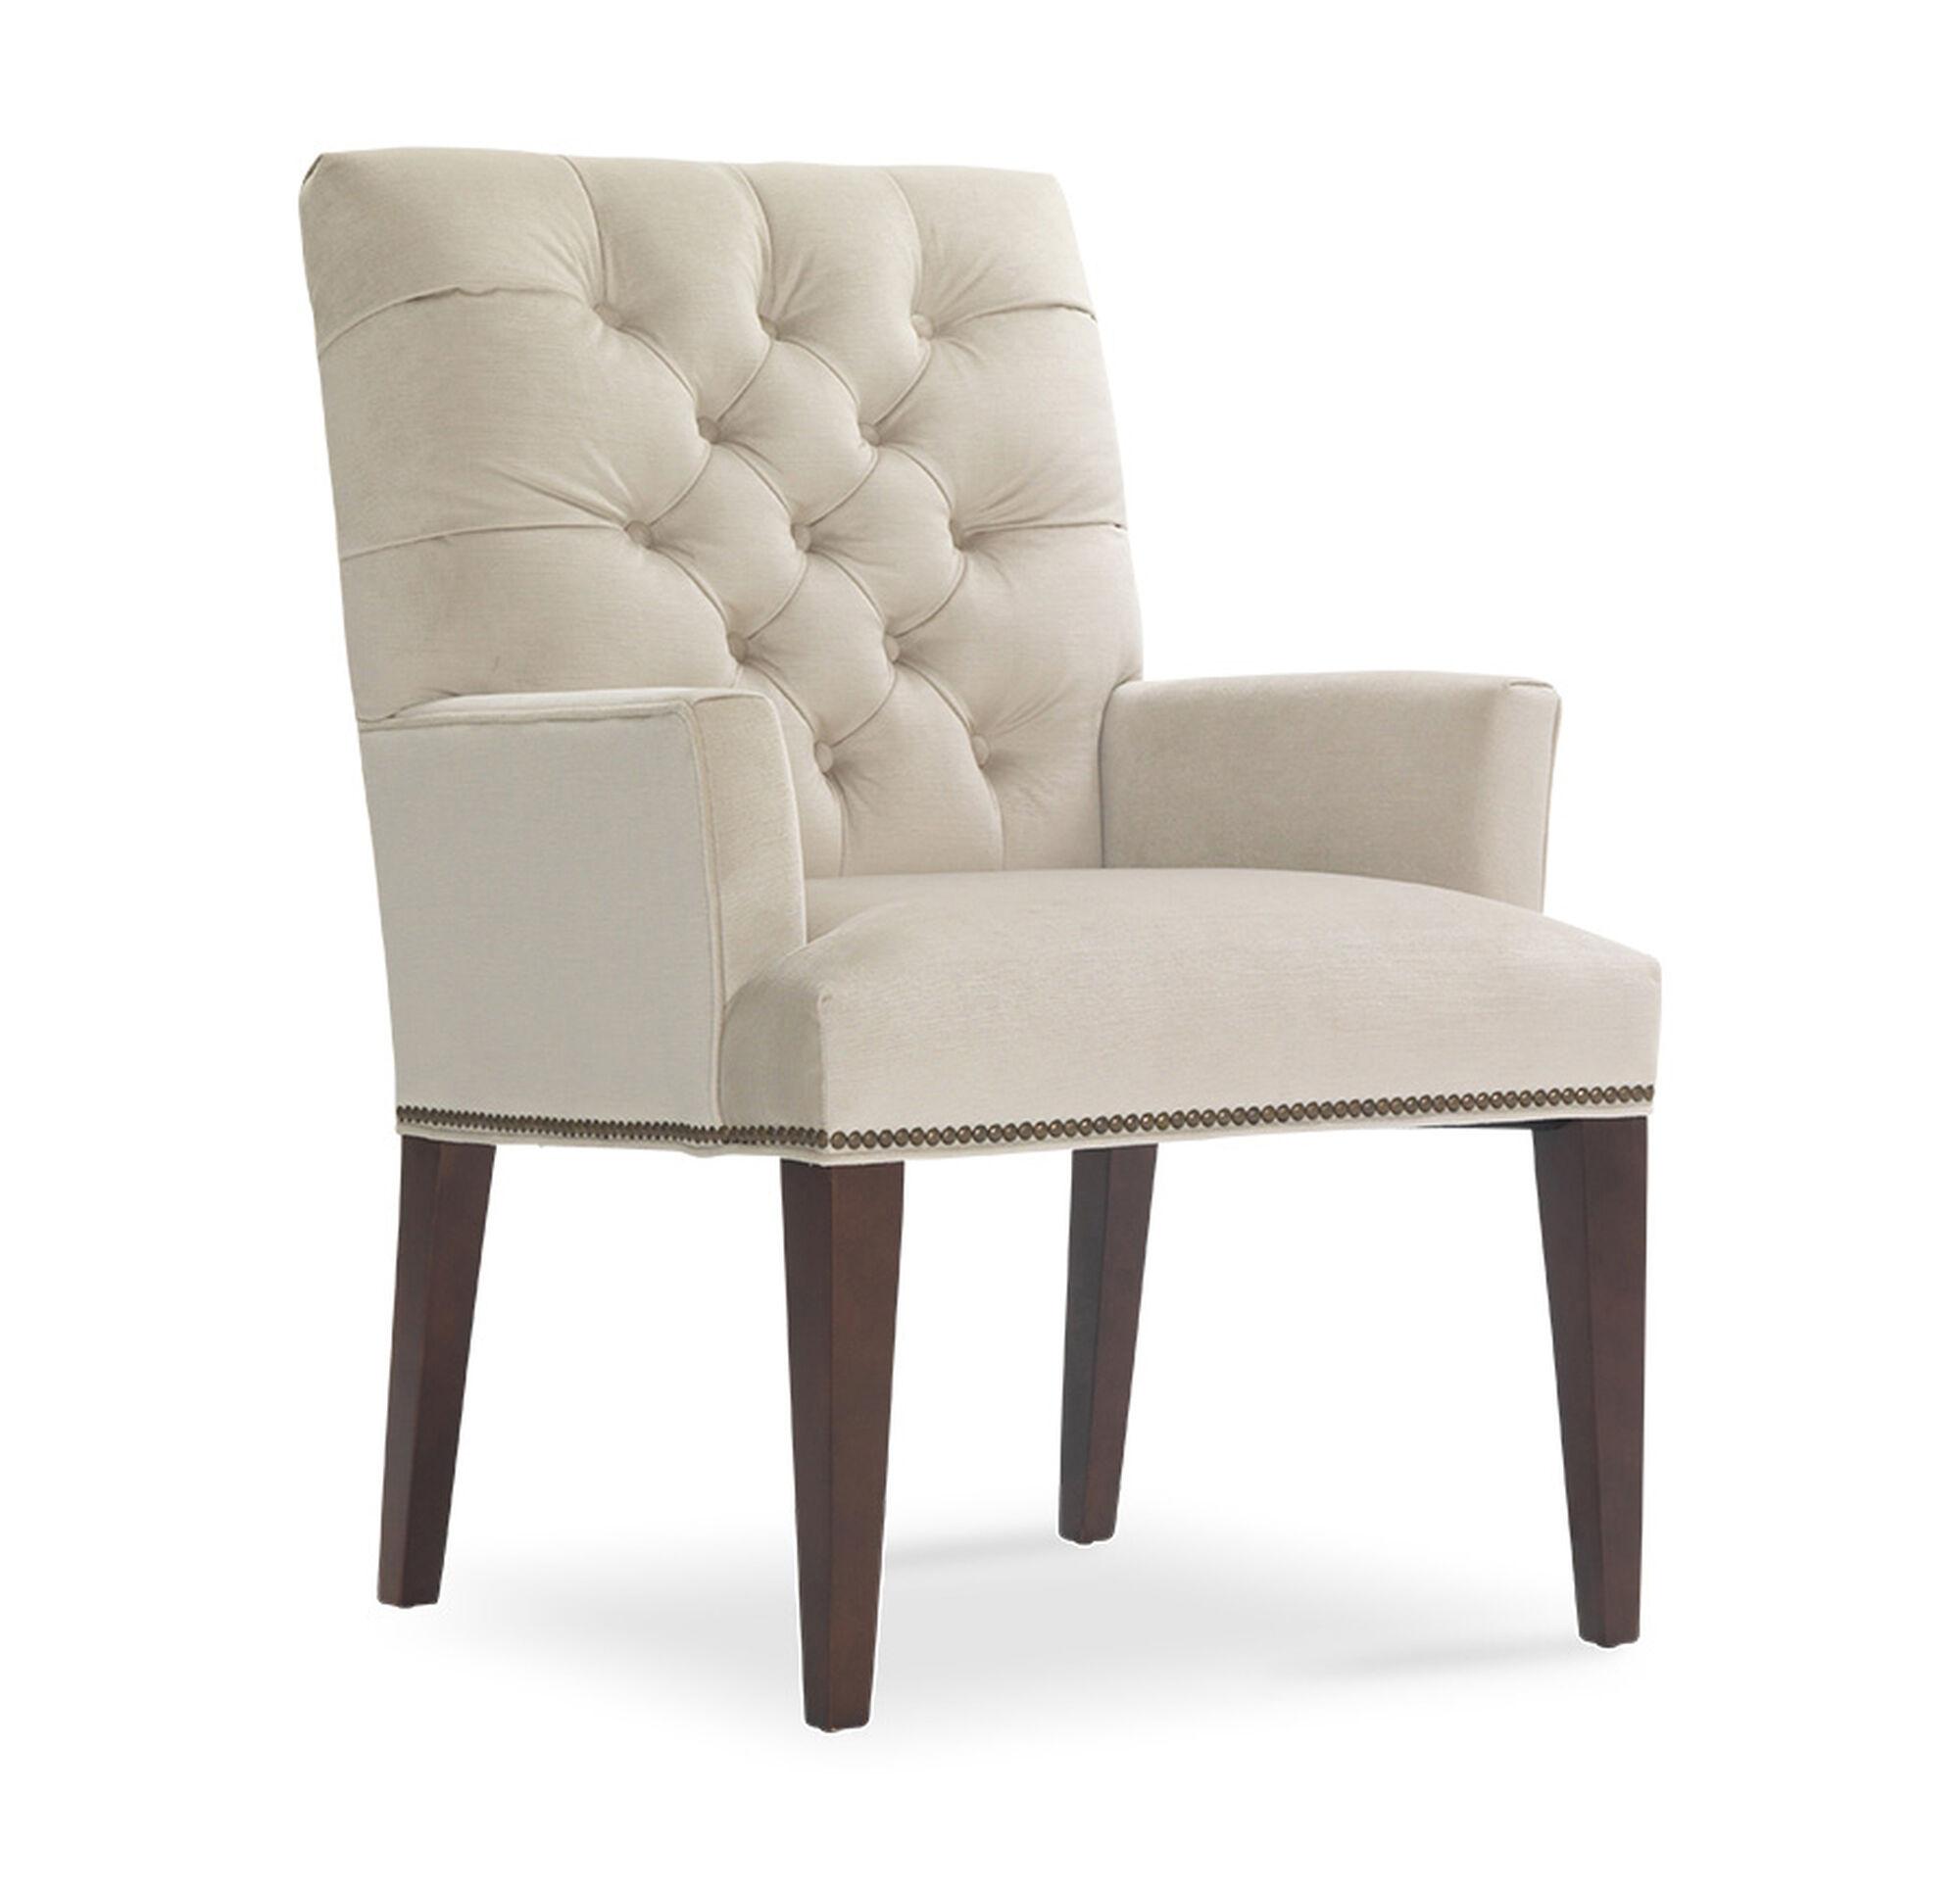 Jacques Arm Chair